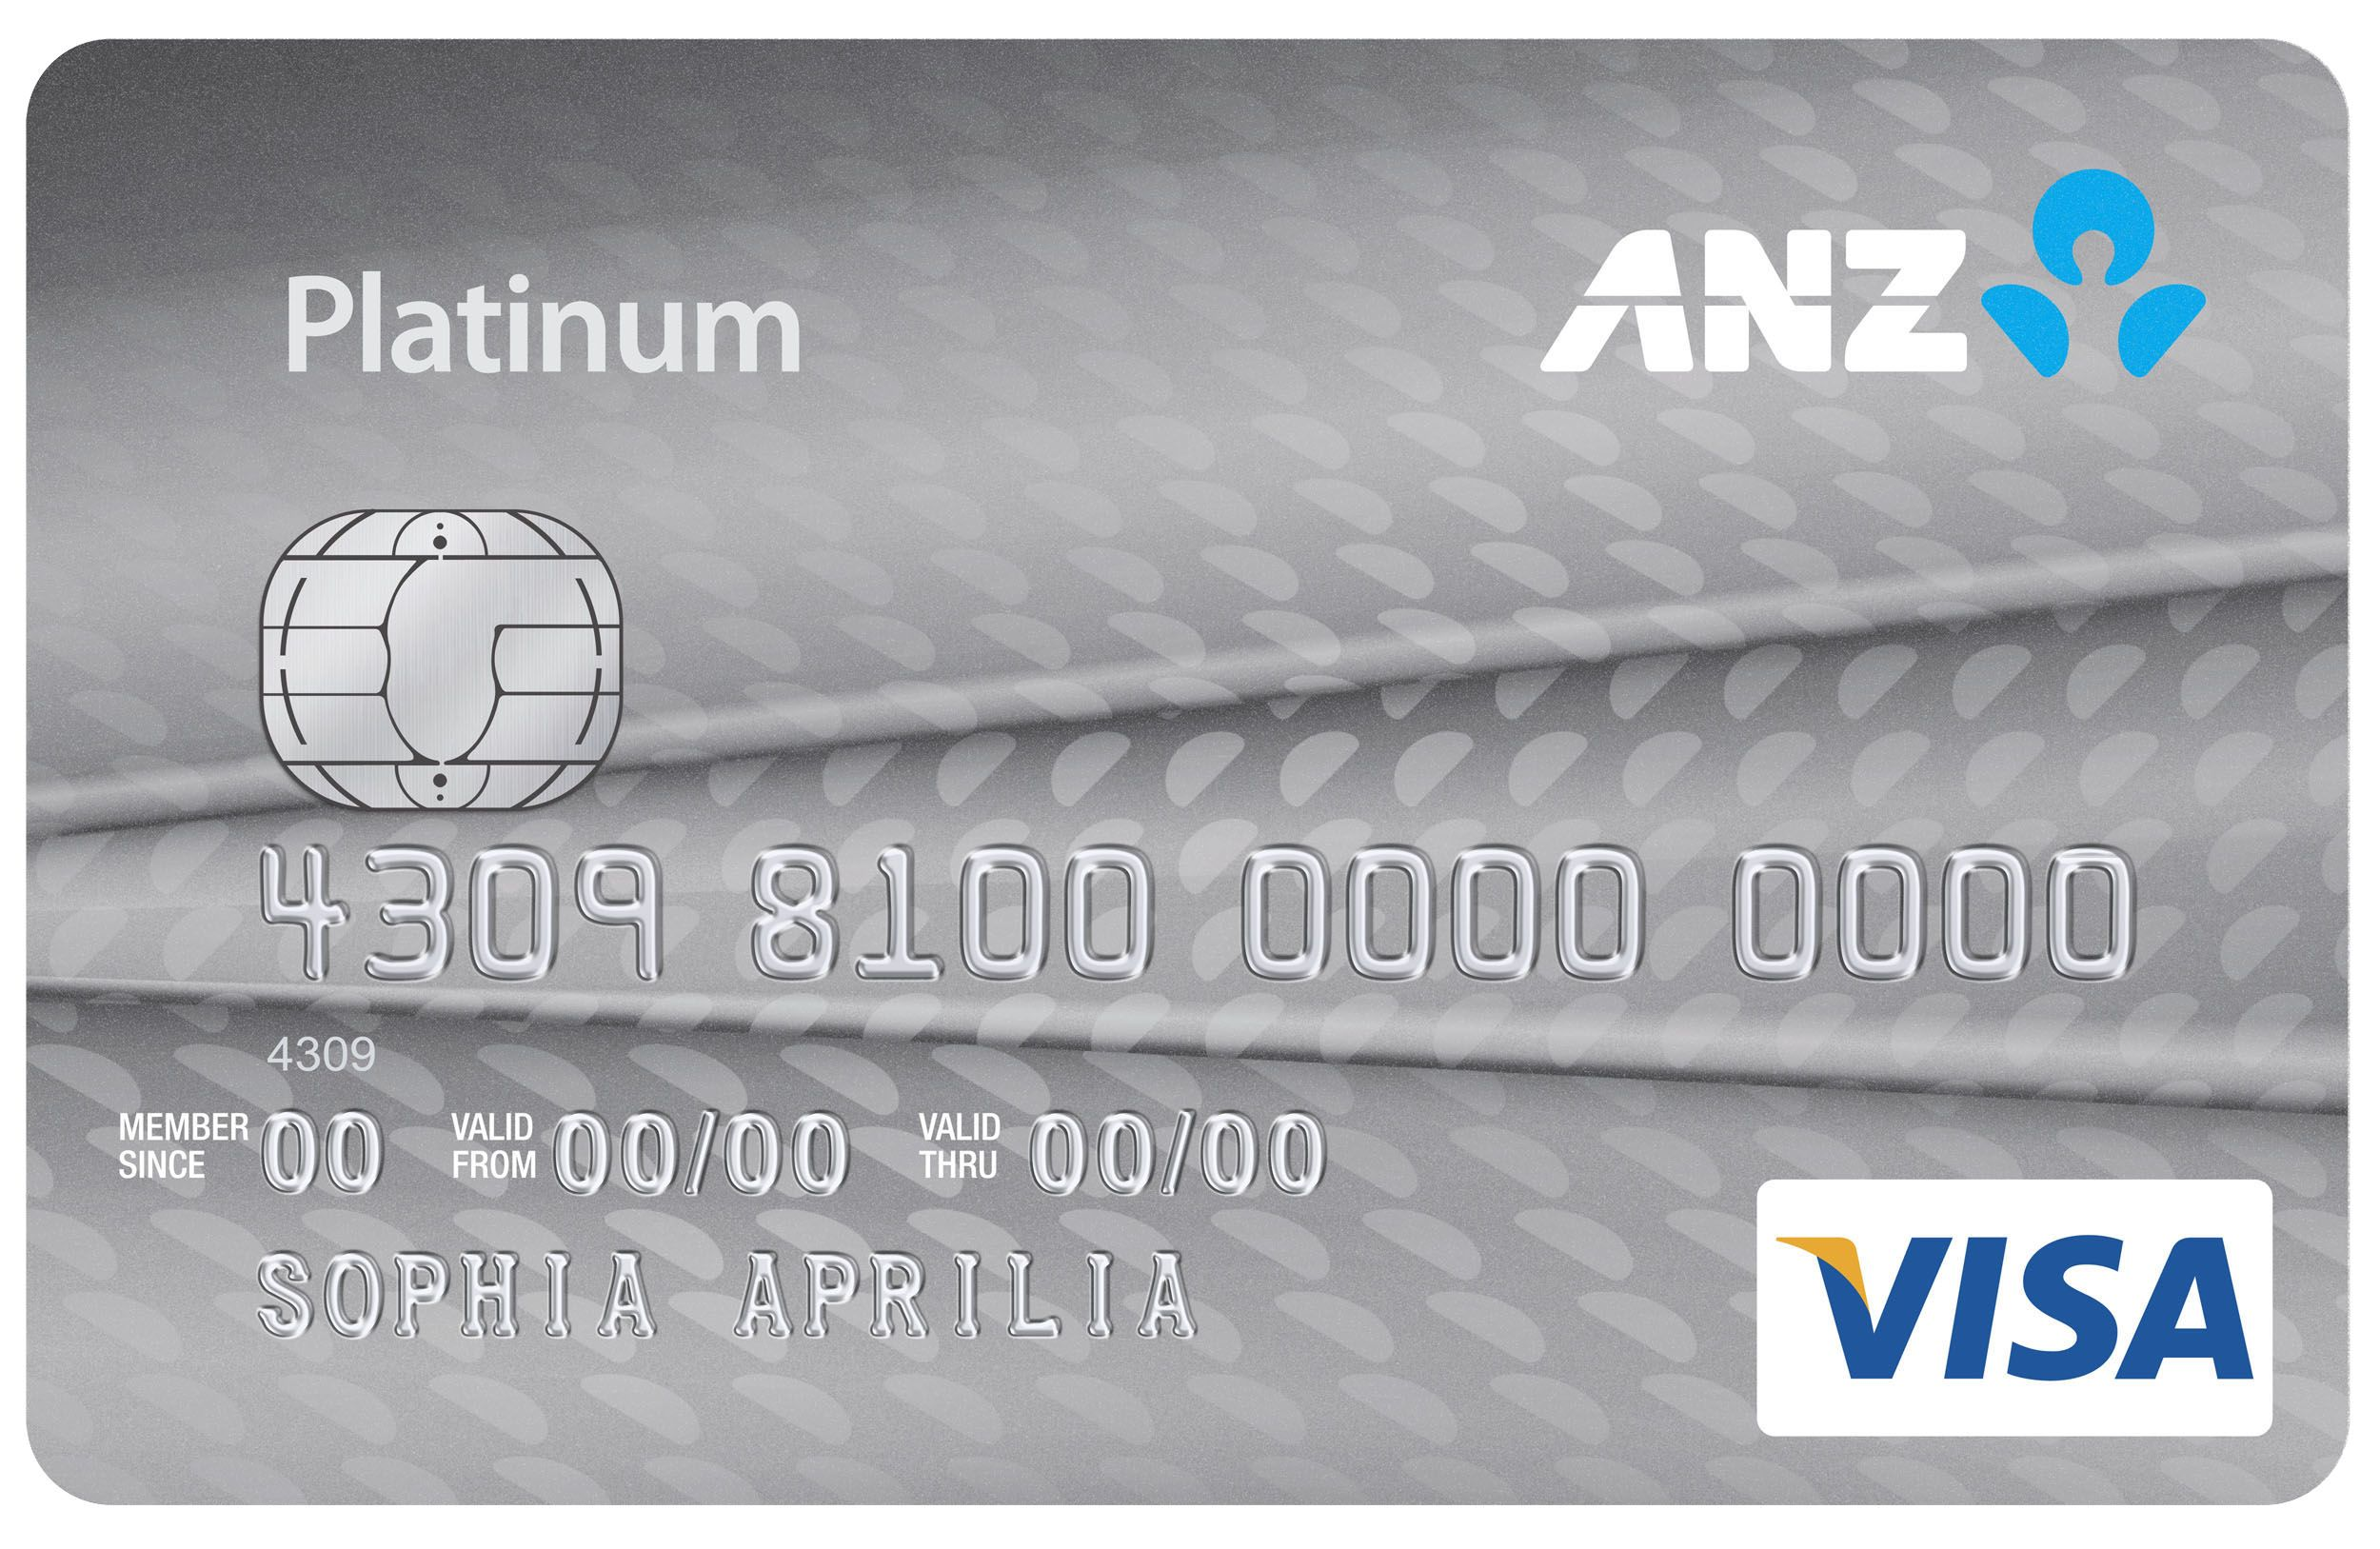 Pin By Mac Jira On Credit Card Designs Visa Platinum Card Credit Card Design Platinum Credit Card